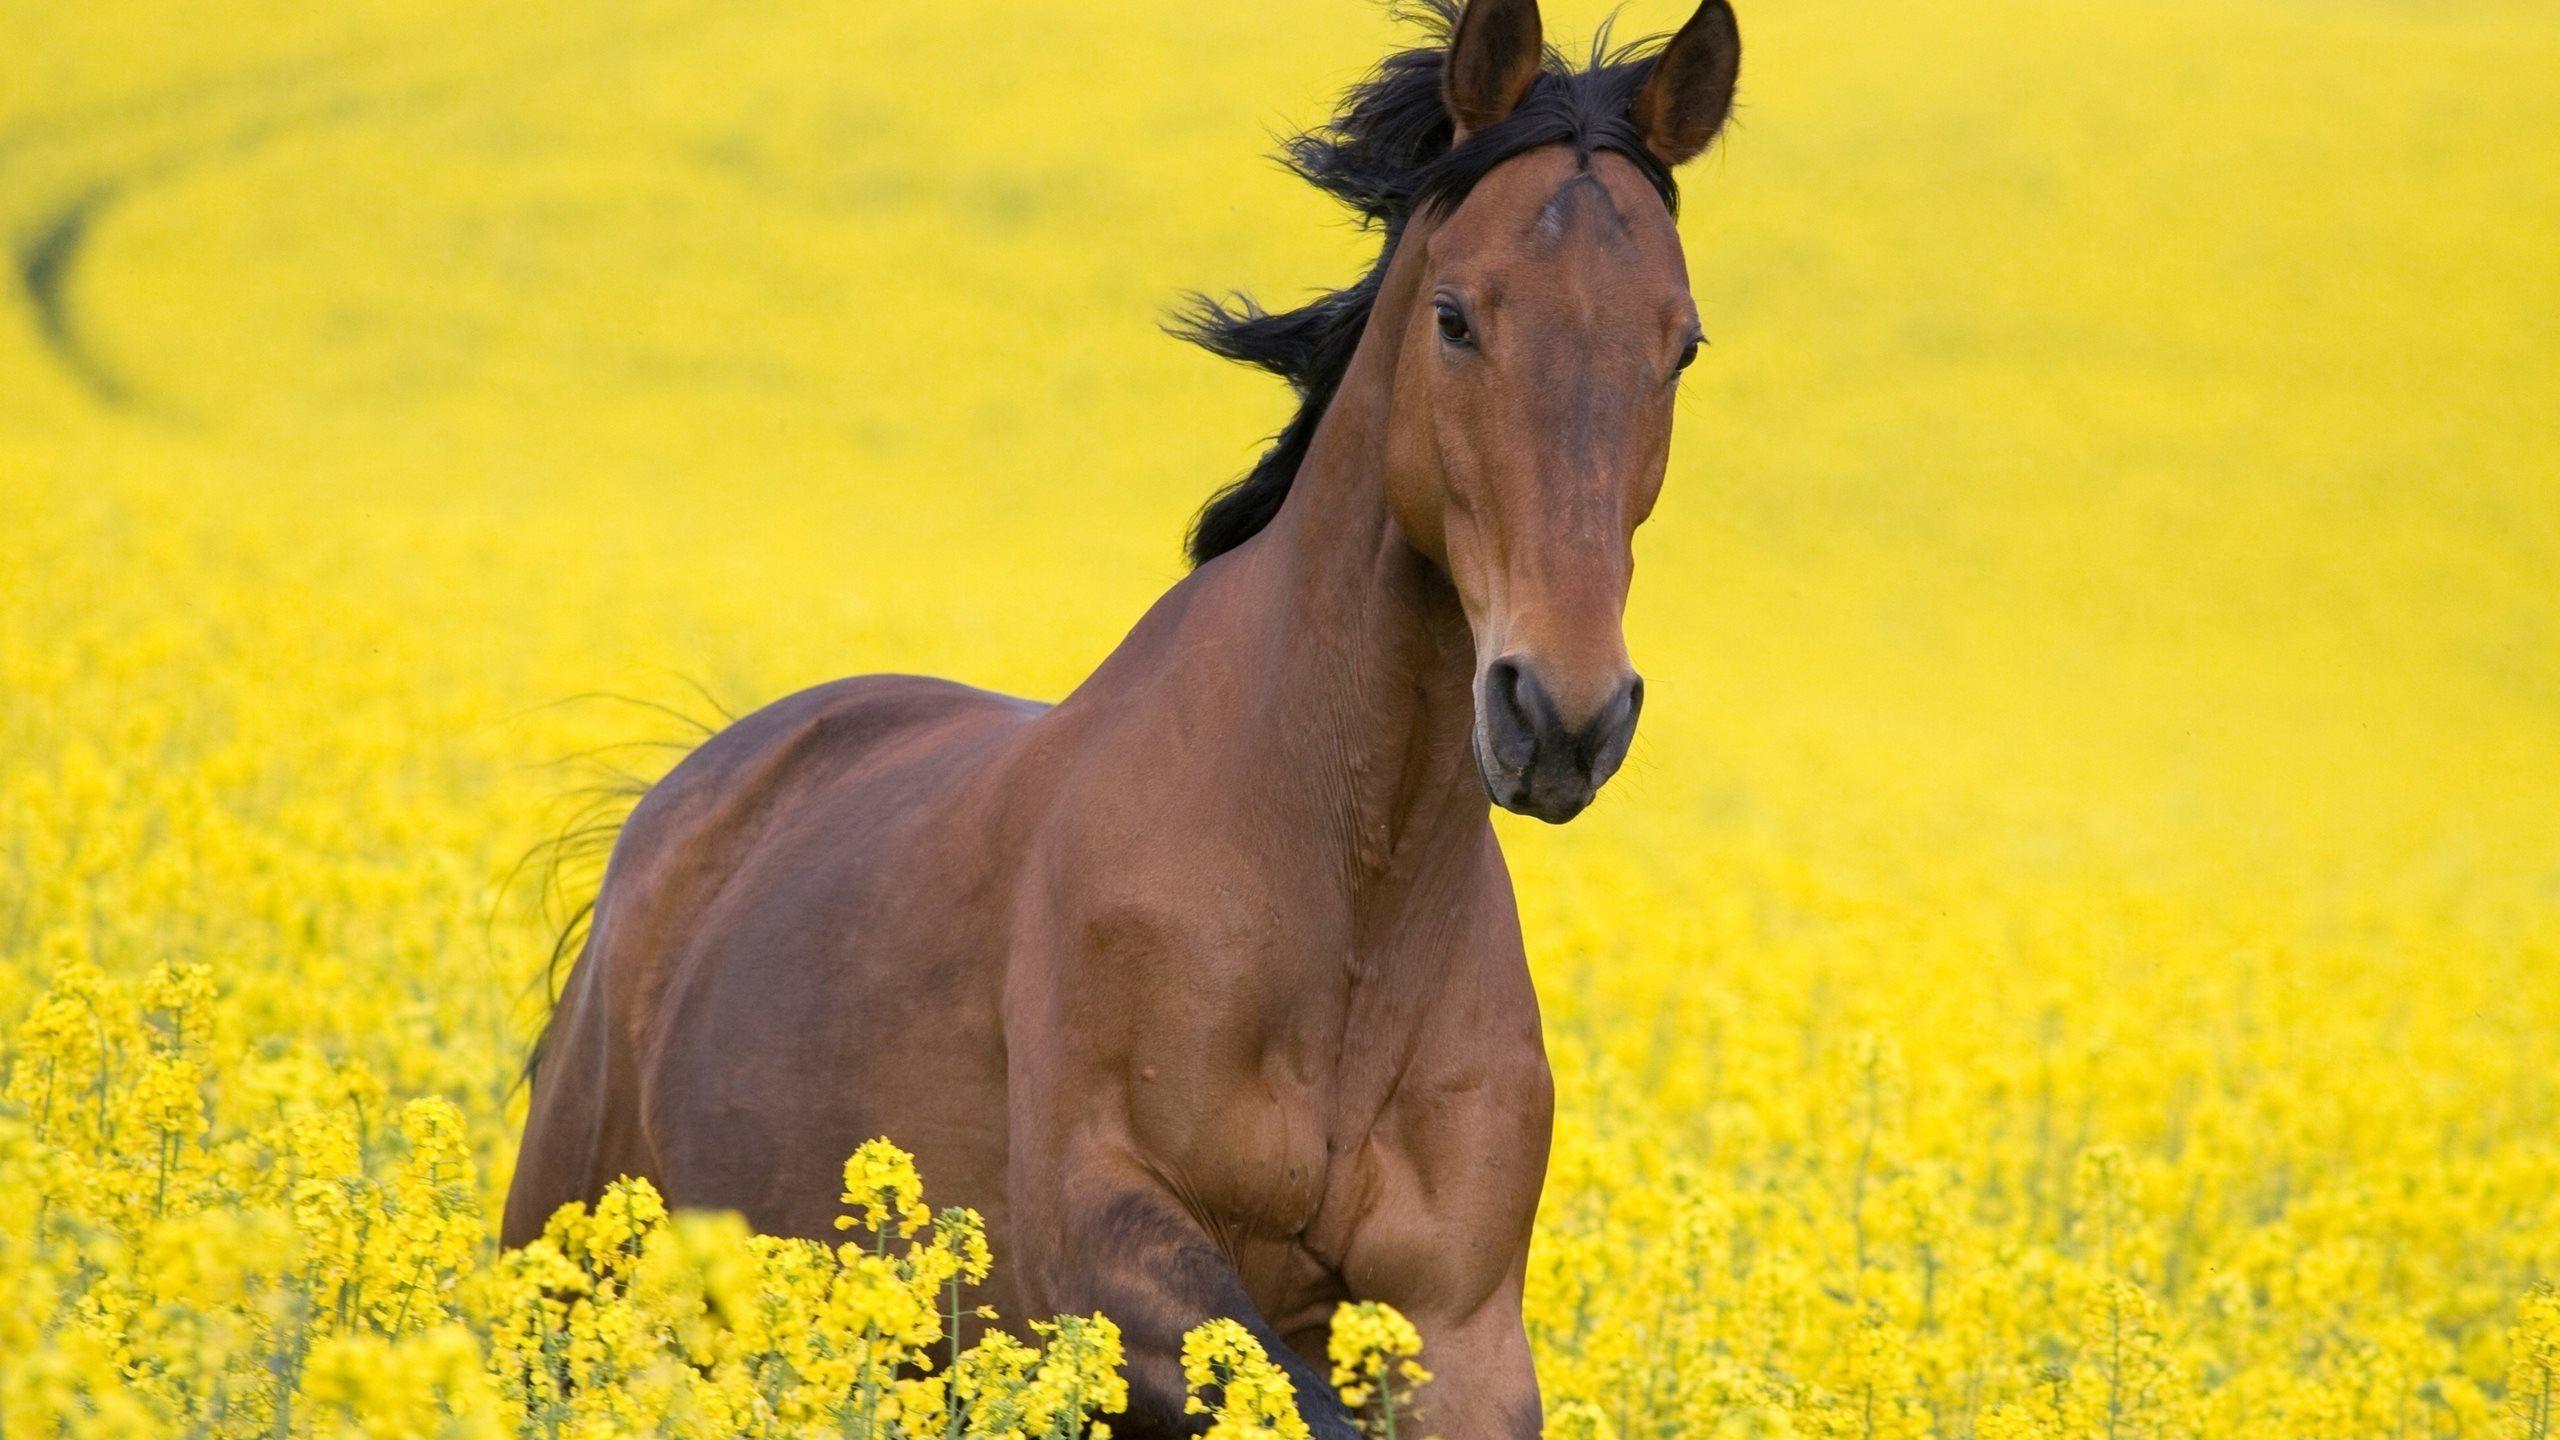 Beautiful Wallpaper Horse Yellow - 03f0d6fc4d8abdd5aed0608c3de83ce0  Graphic_644964.jpg